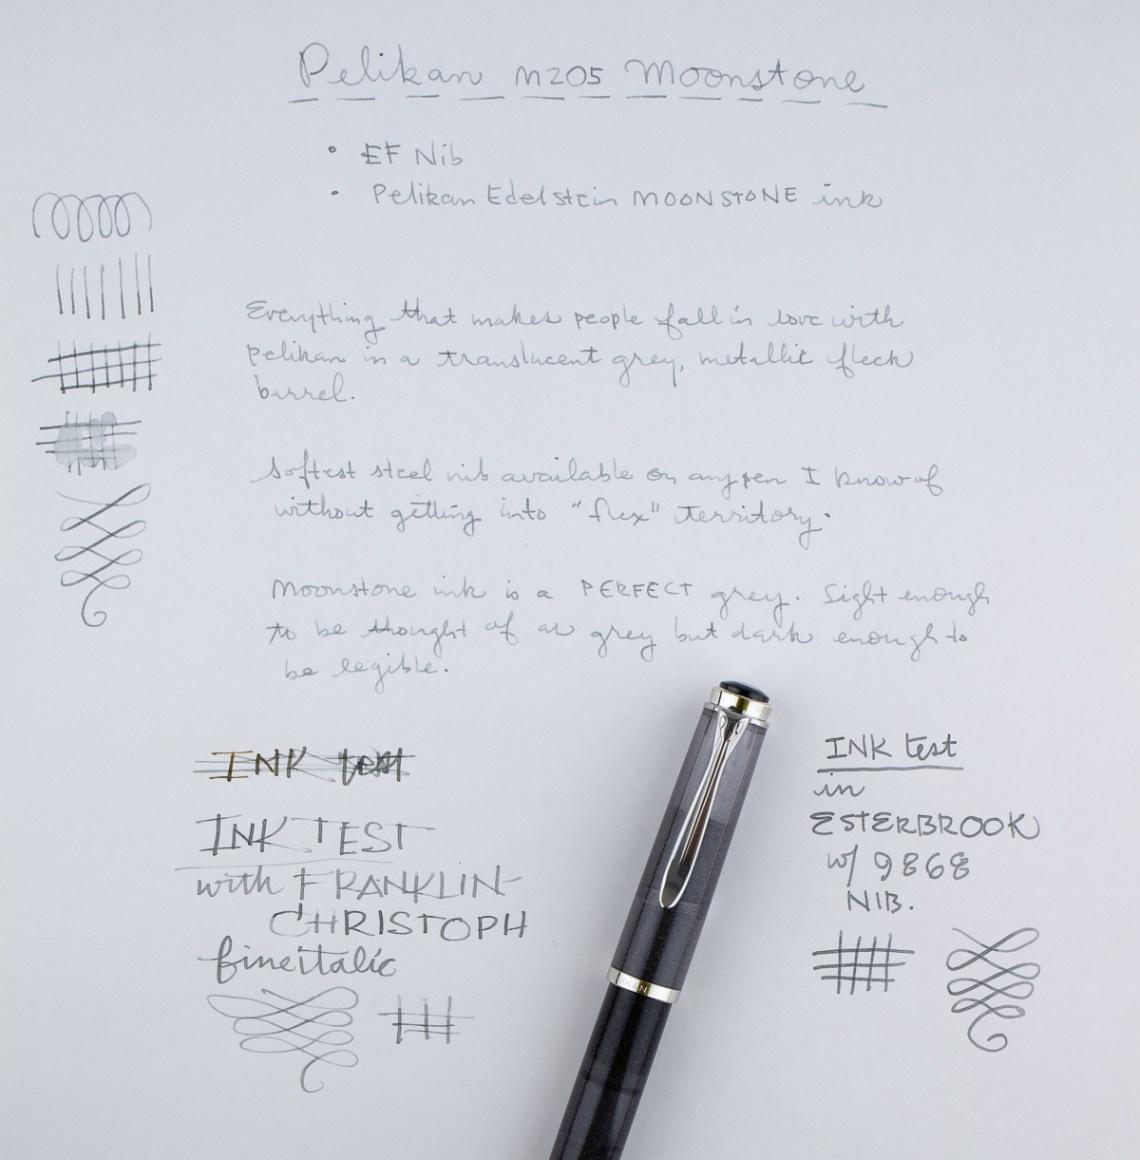 Pelikan M205 EF writing